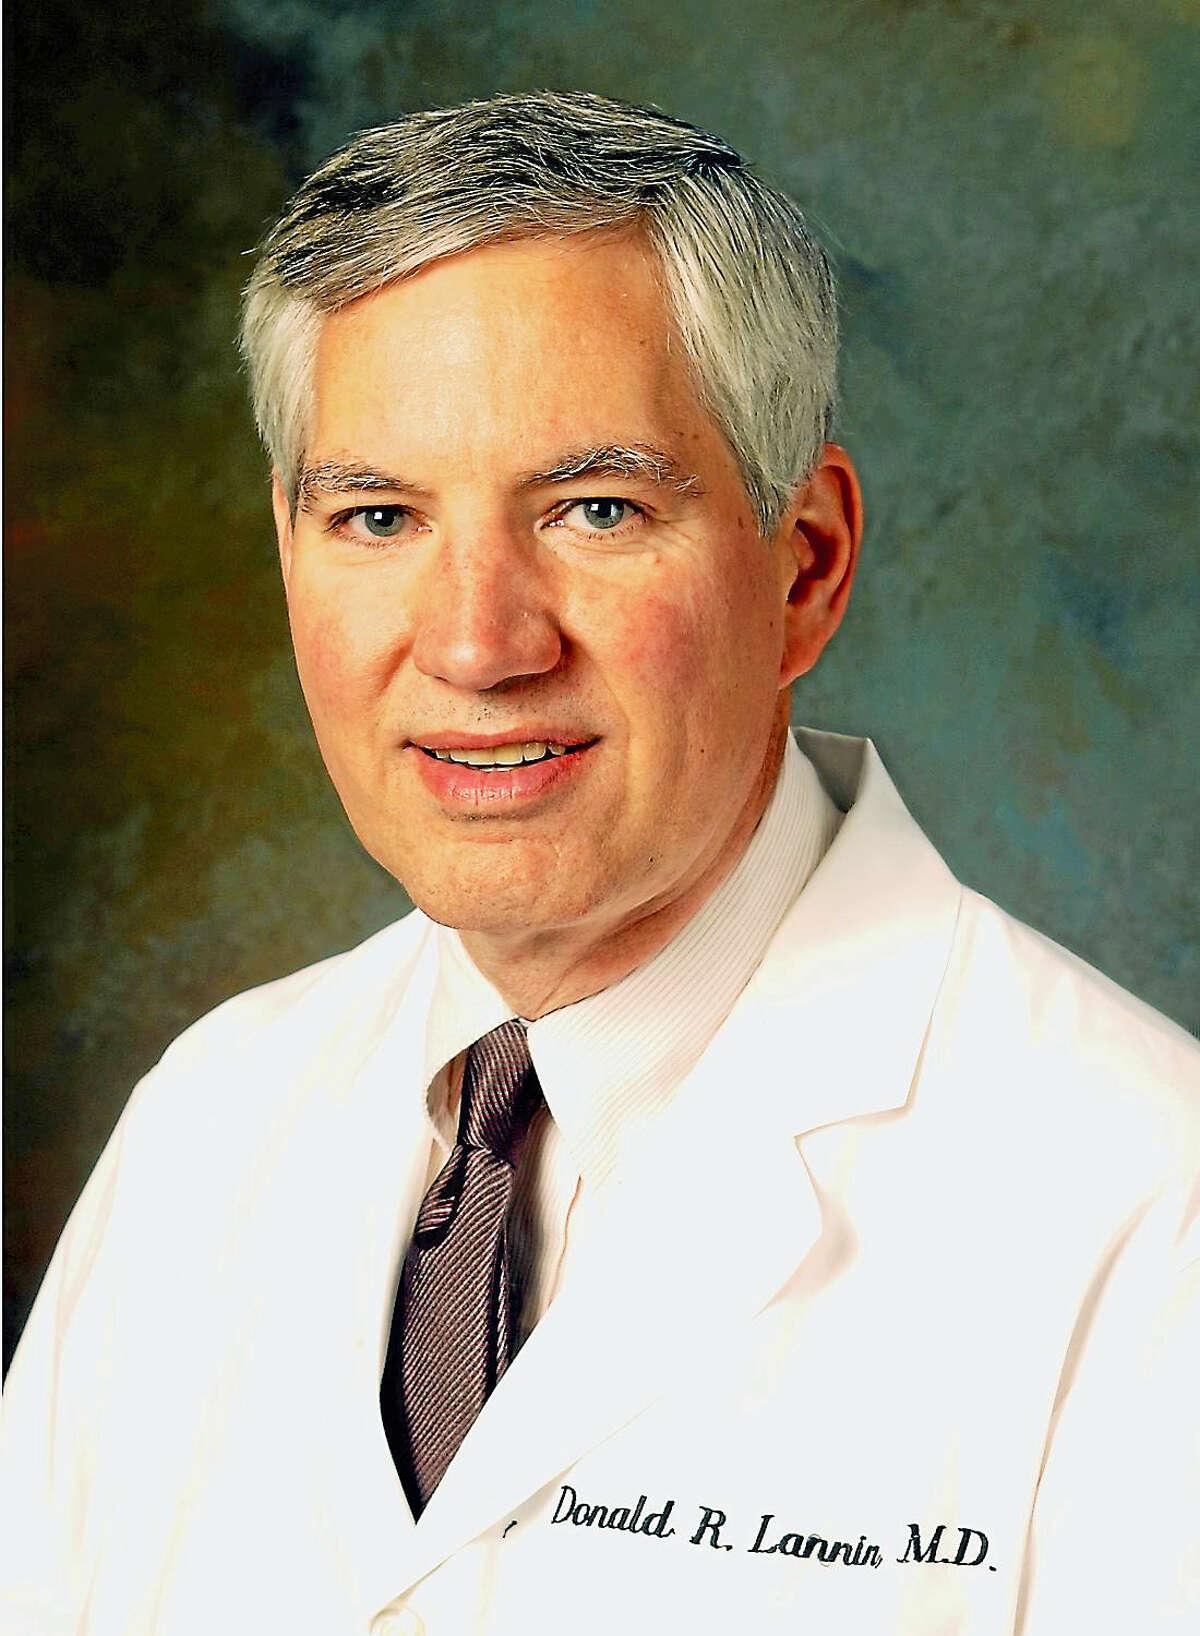 Dr. Donald R. Lannin